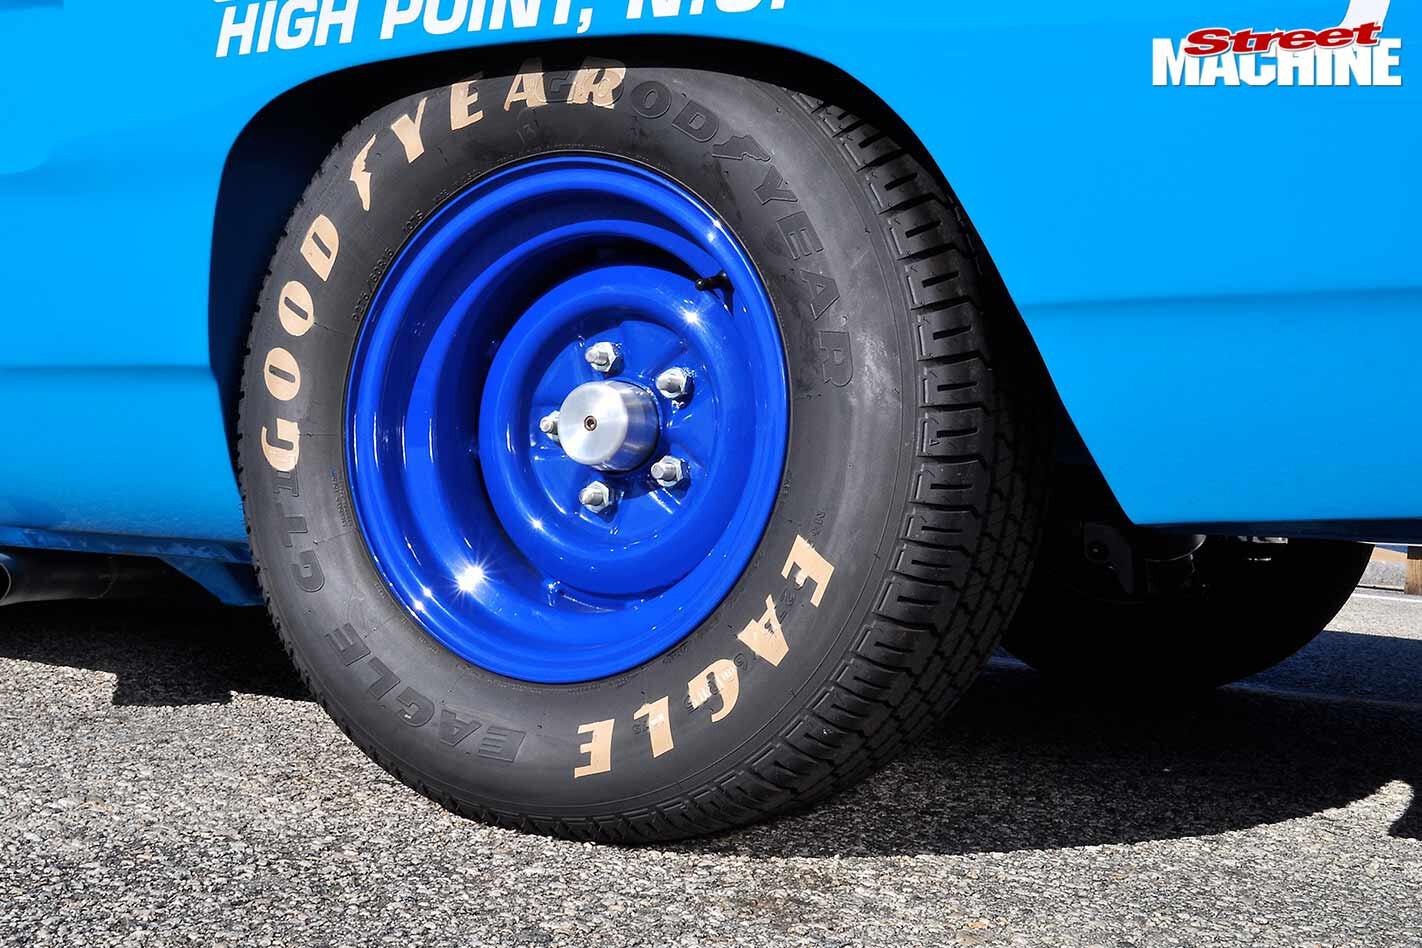 Plymouth Superbird wheel